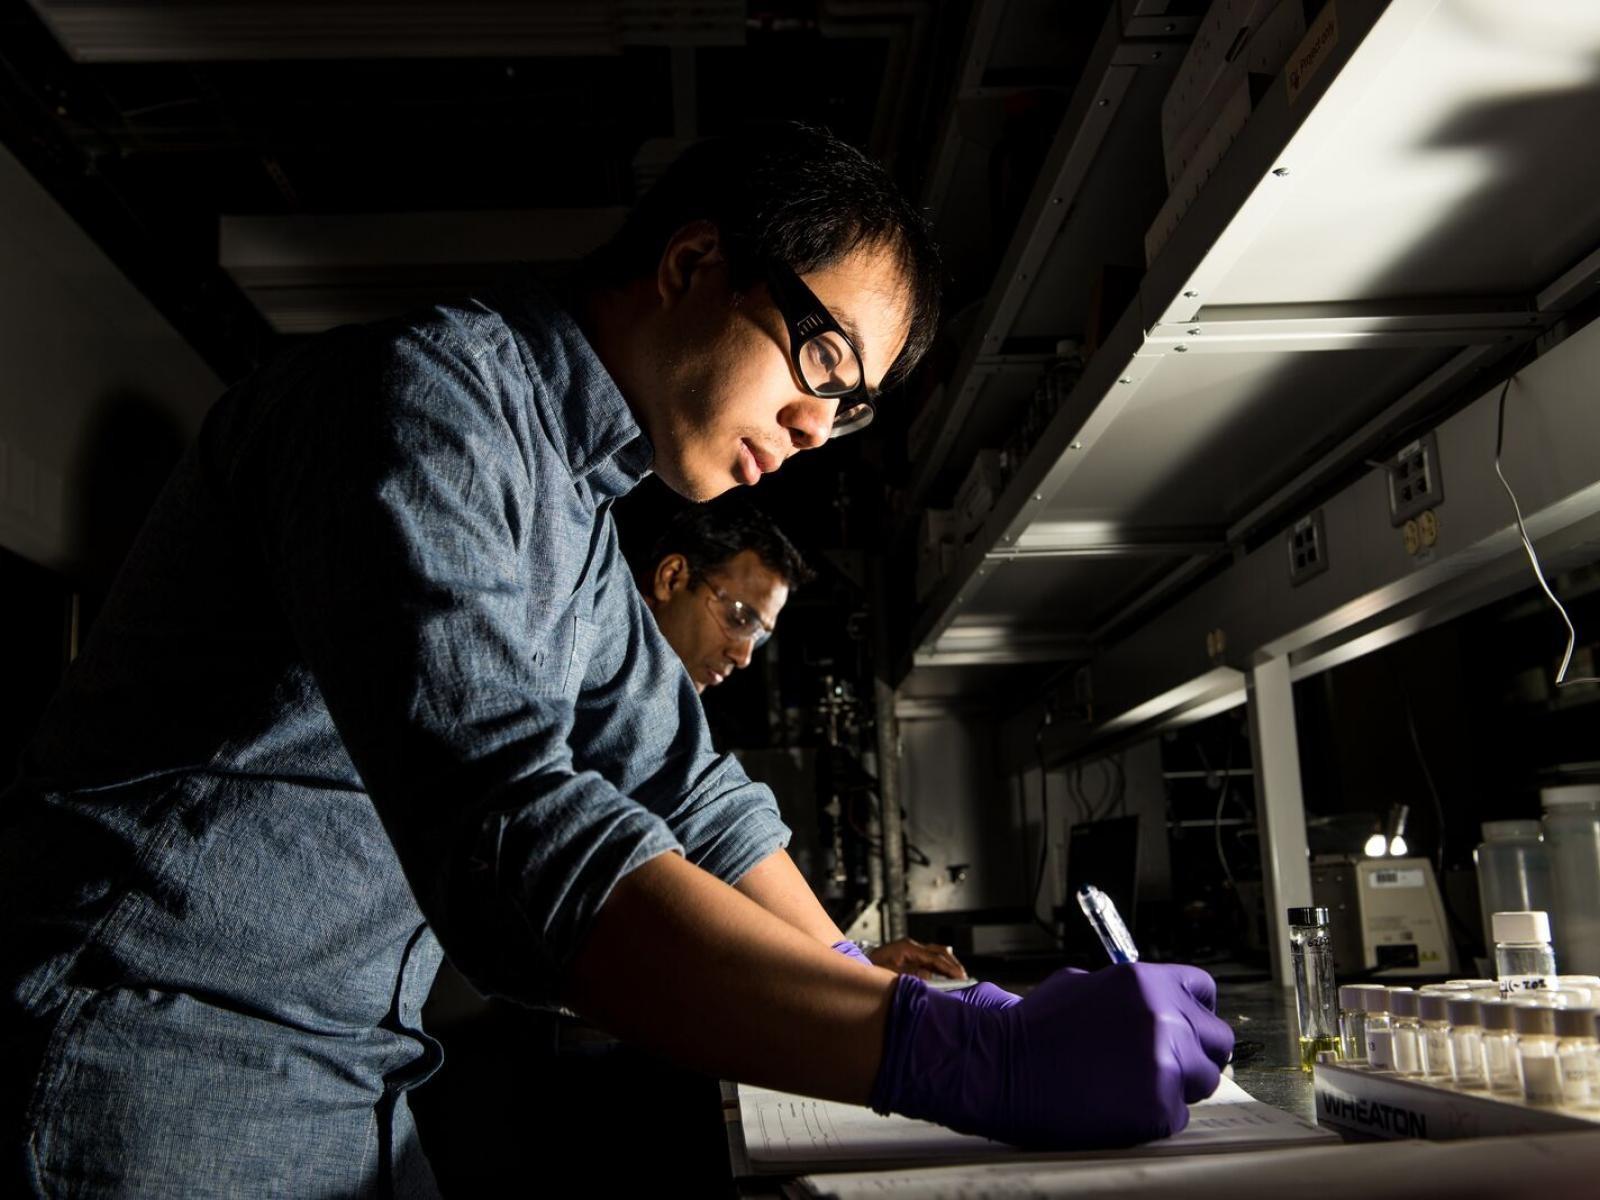 PNNL团队开发出将乙醇转化为C5+酮的催化剂,作为高价值化学品和燃料的基础